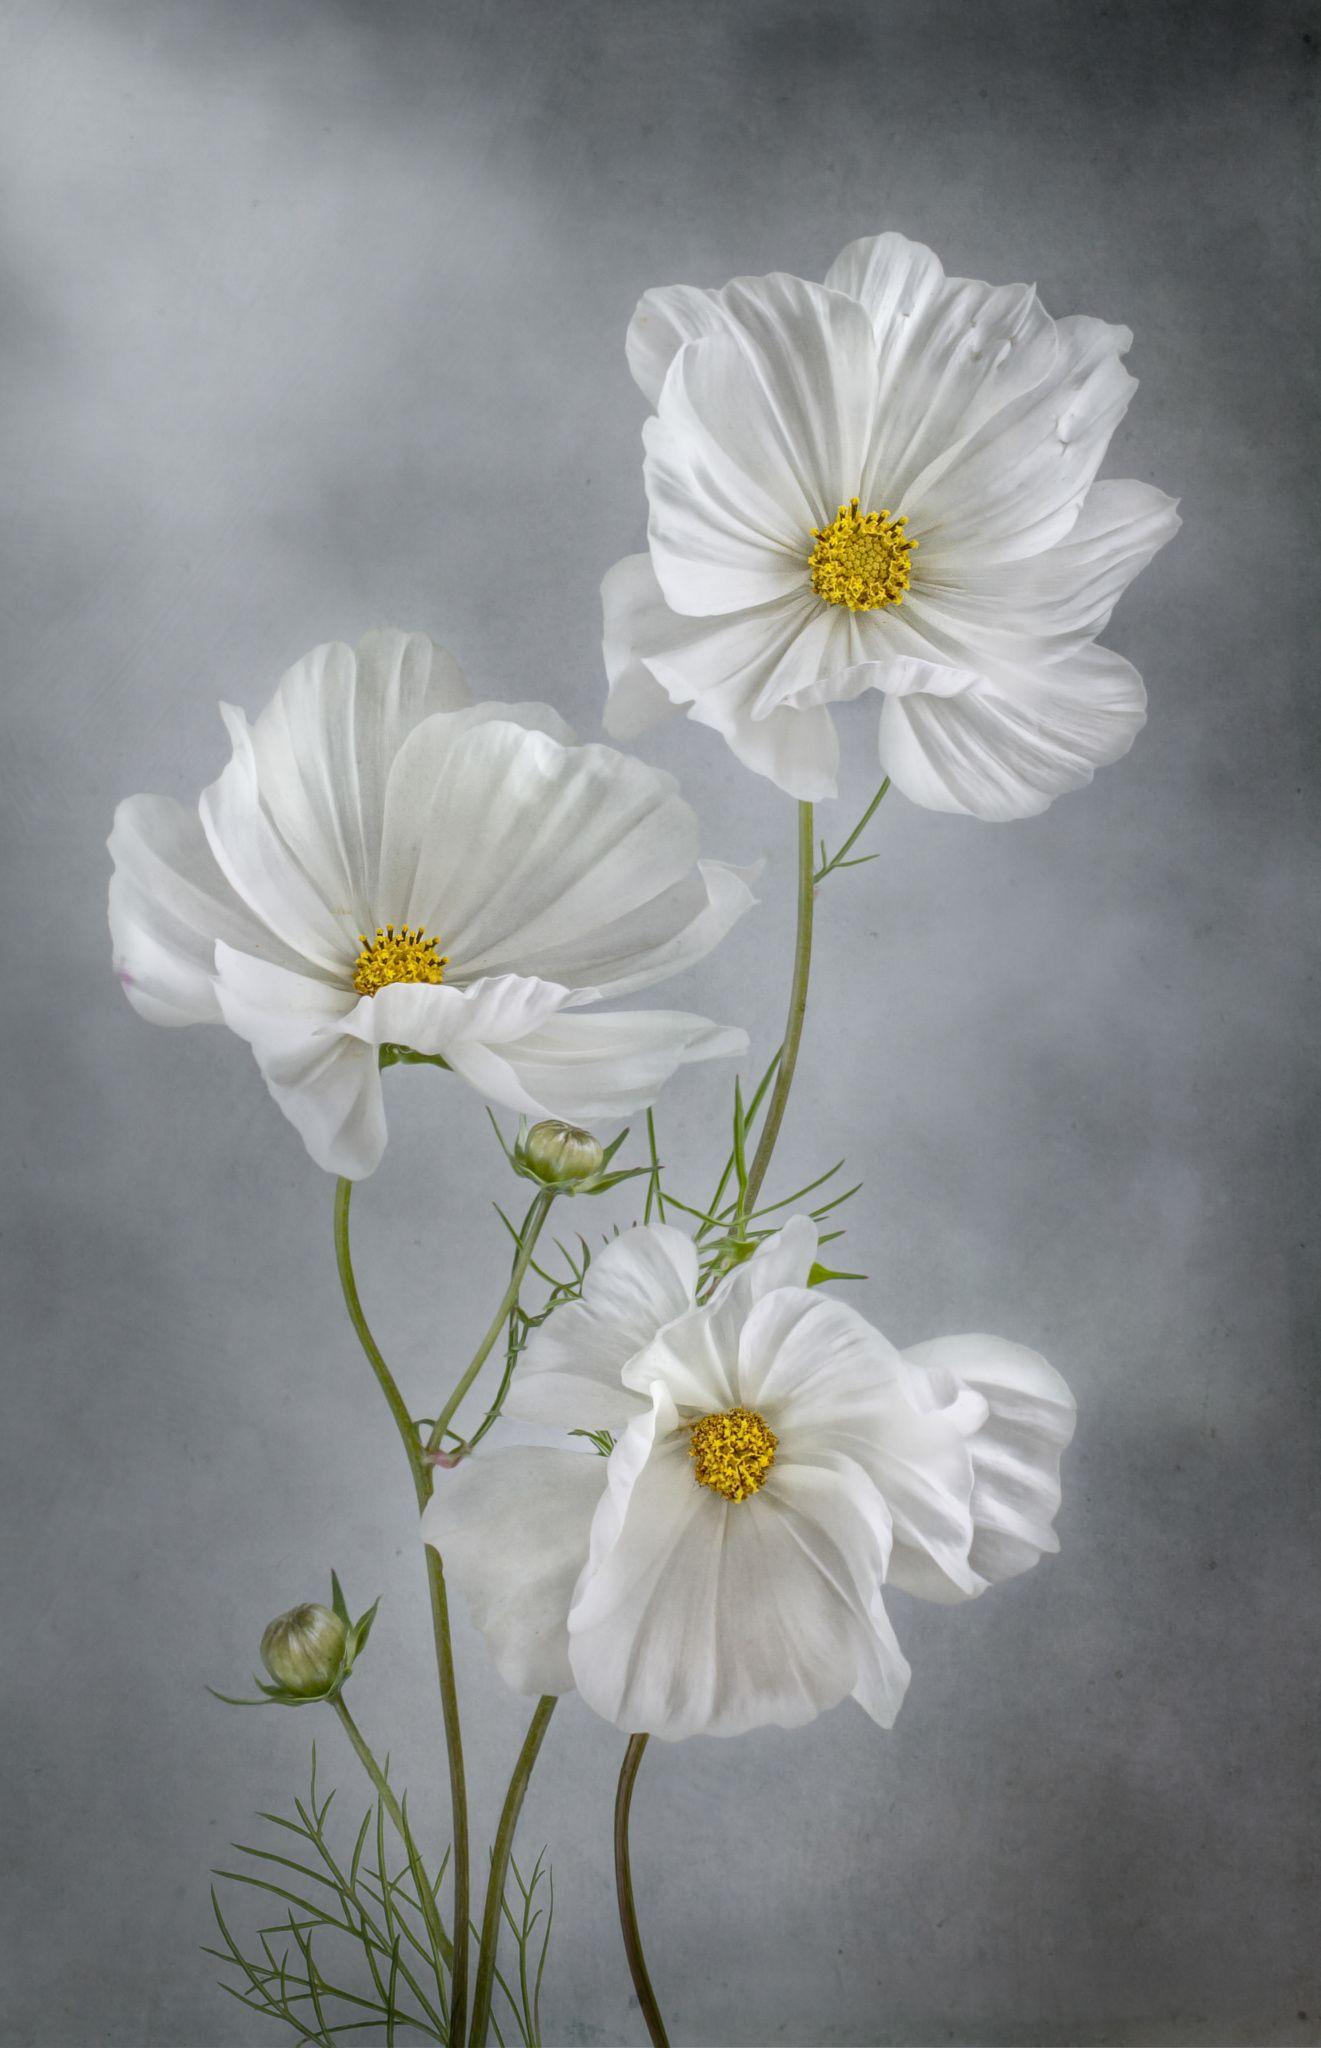 Cosmos by mandy disher flowers breathtaking pinterest cosmos by mandy disher white cosmo cosmos flowers exotic flowers mightylinksfo